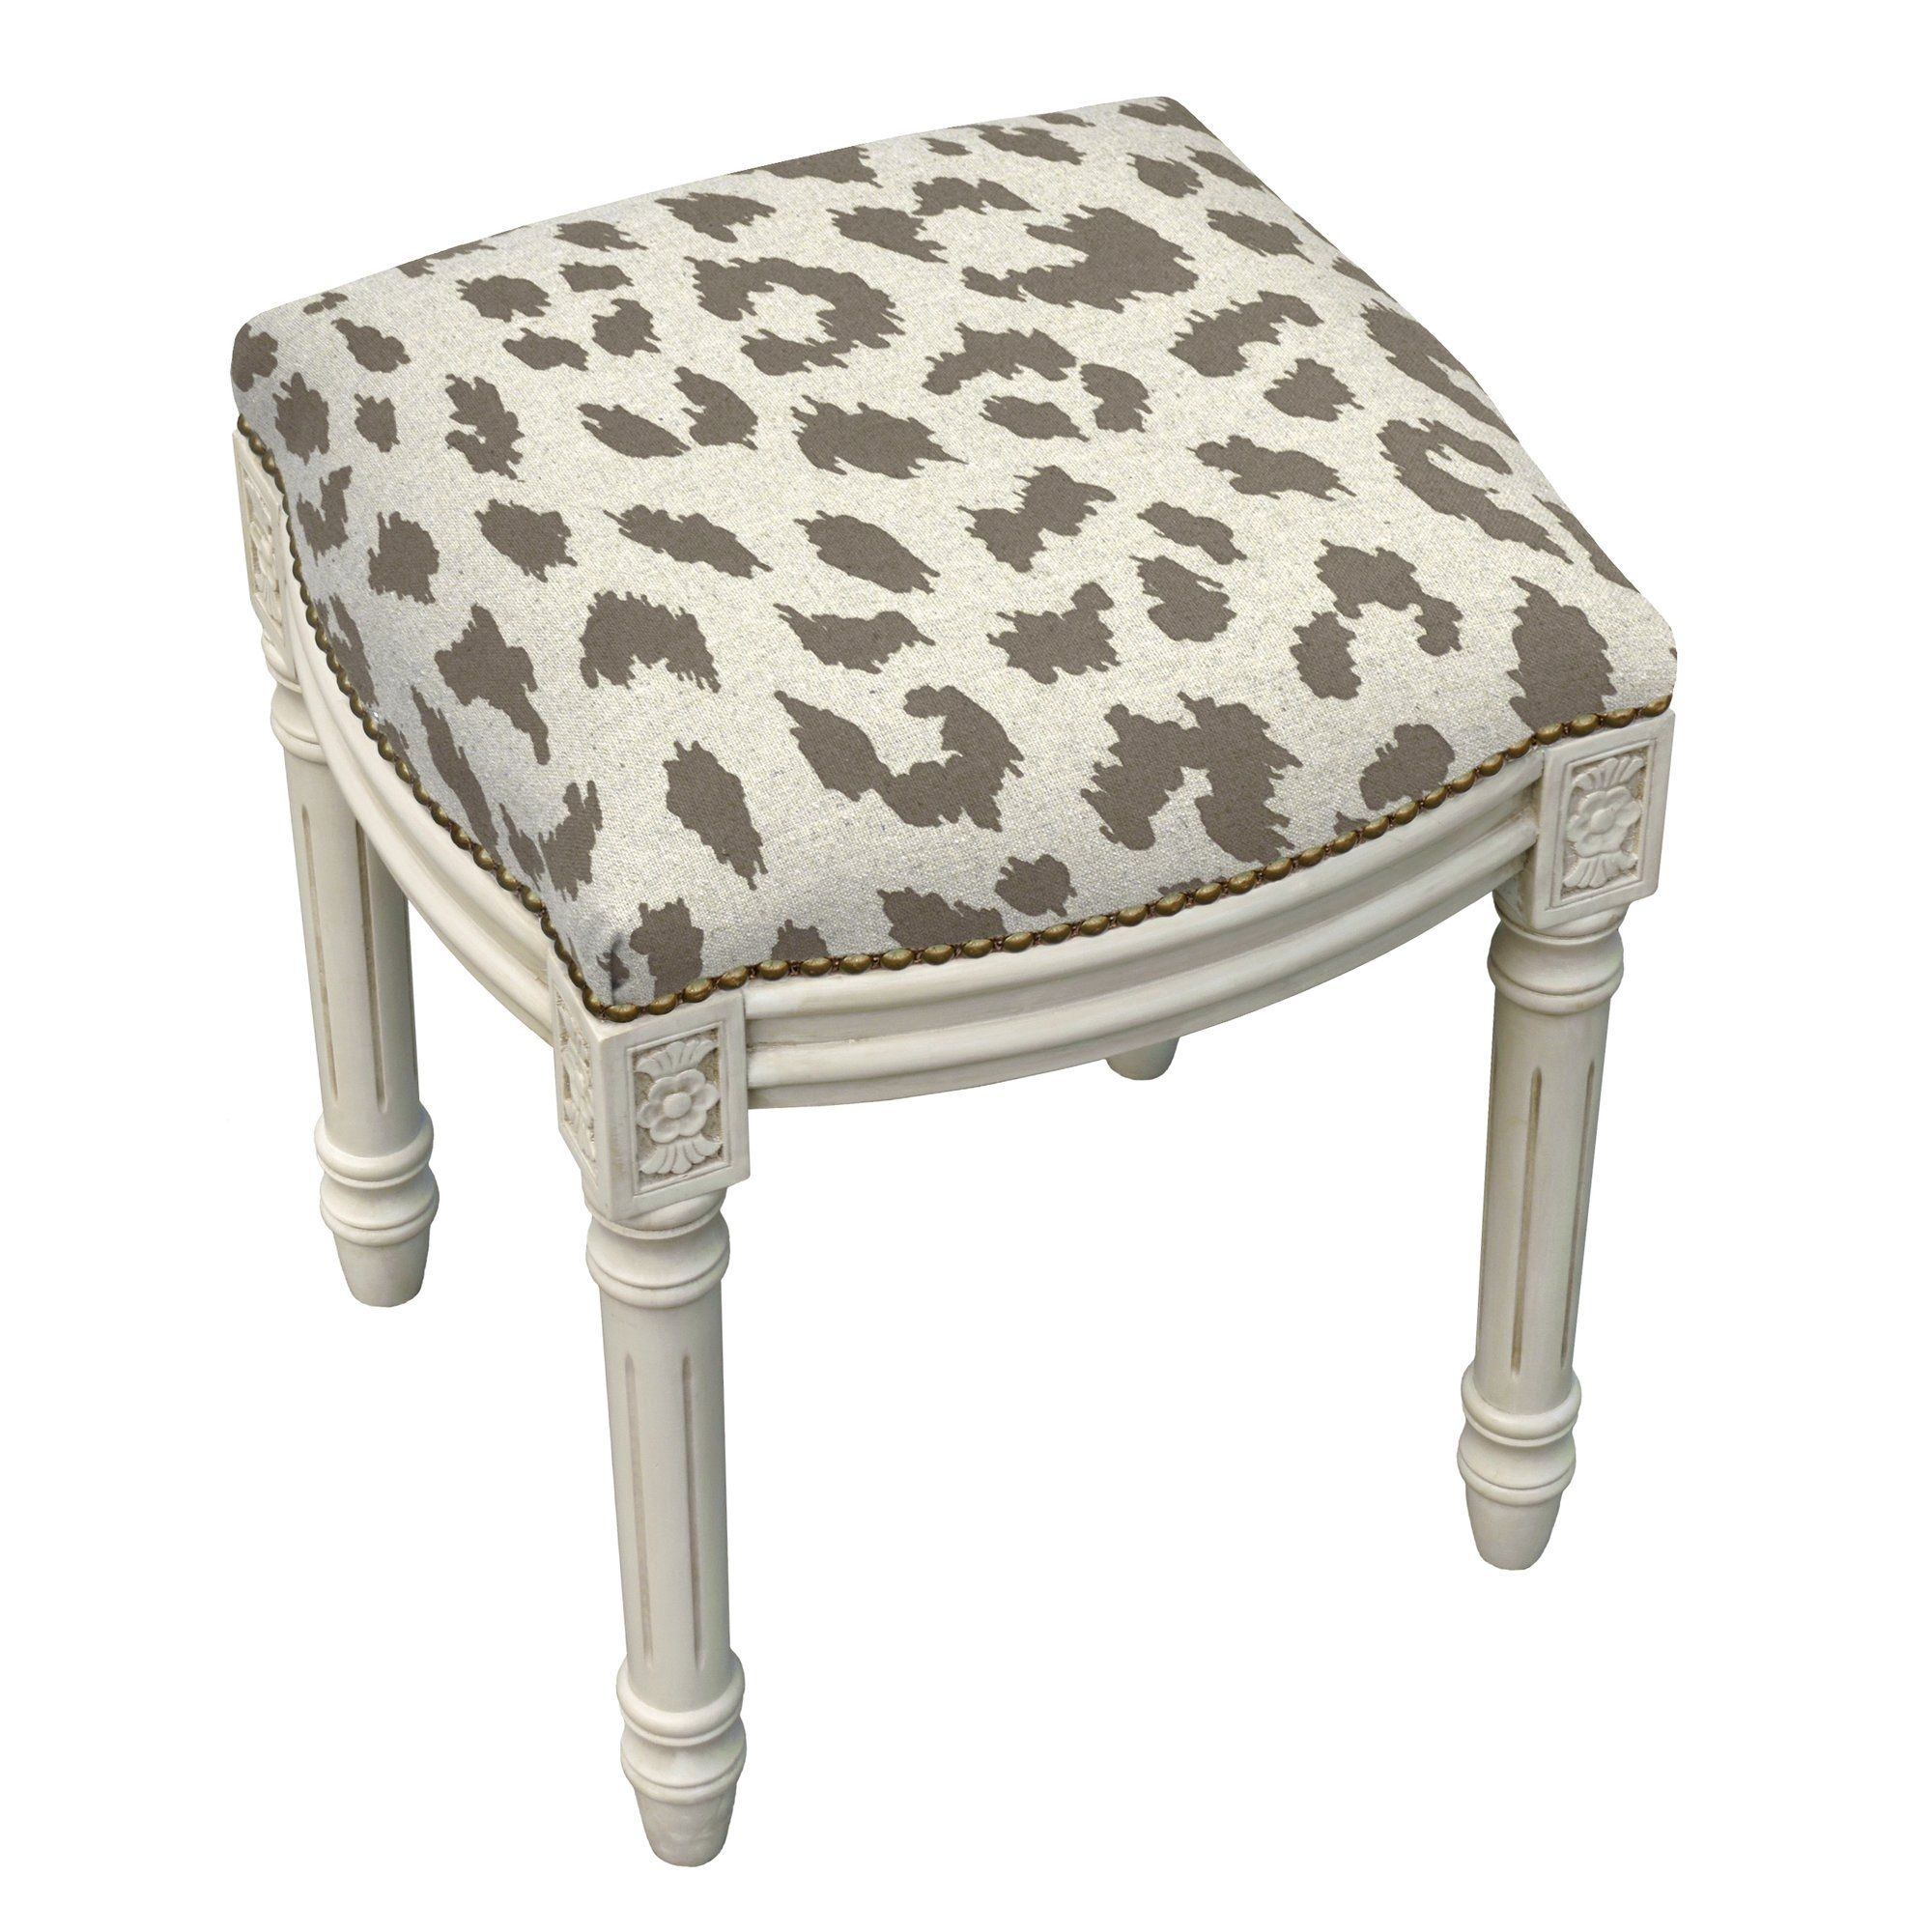 Cheetah Print Upholstered Vanity Stool | Animal Print Bench Ideas ...